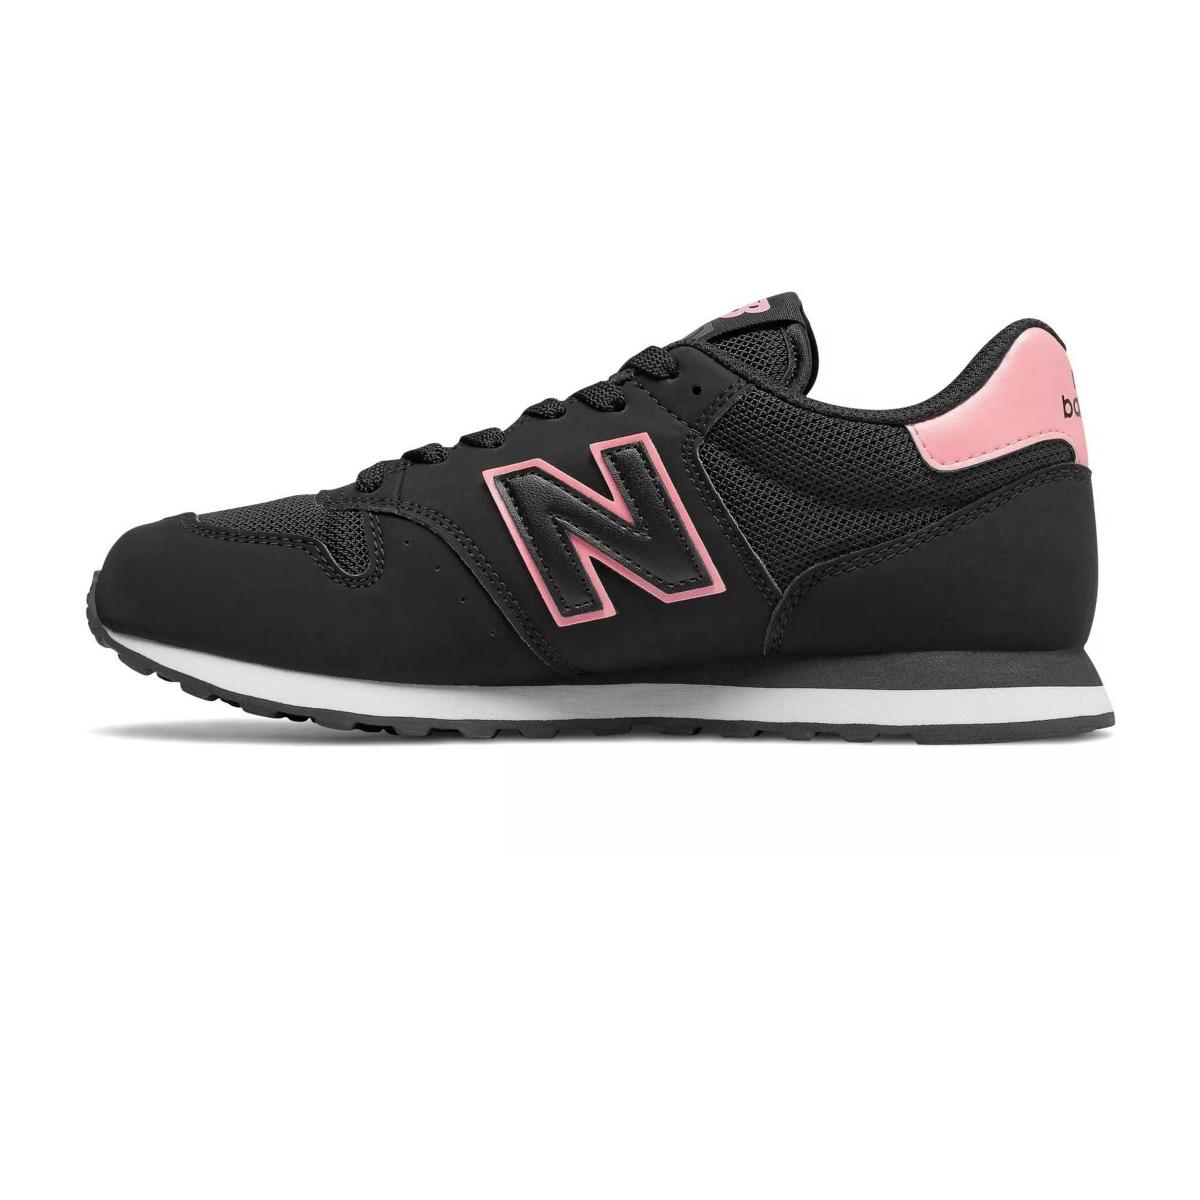 Scarpe Sneakers New Balance da donna rif. GW500SBP